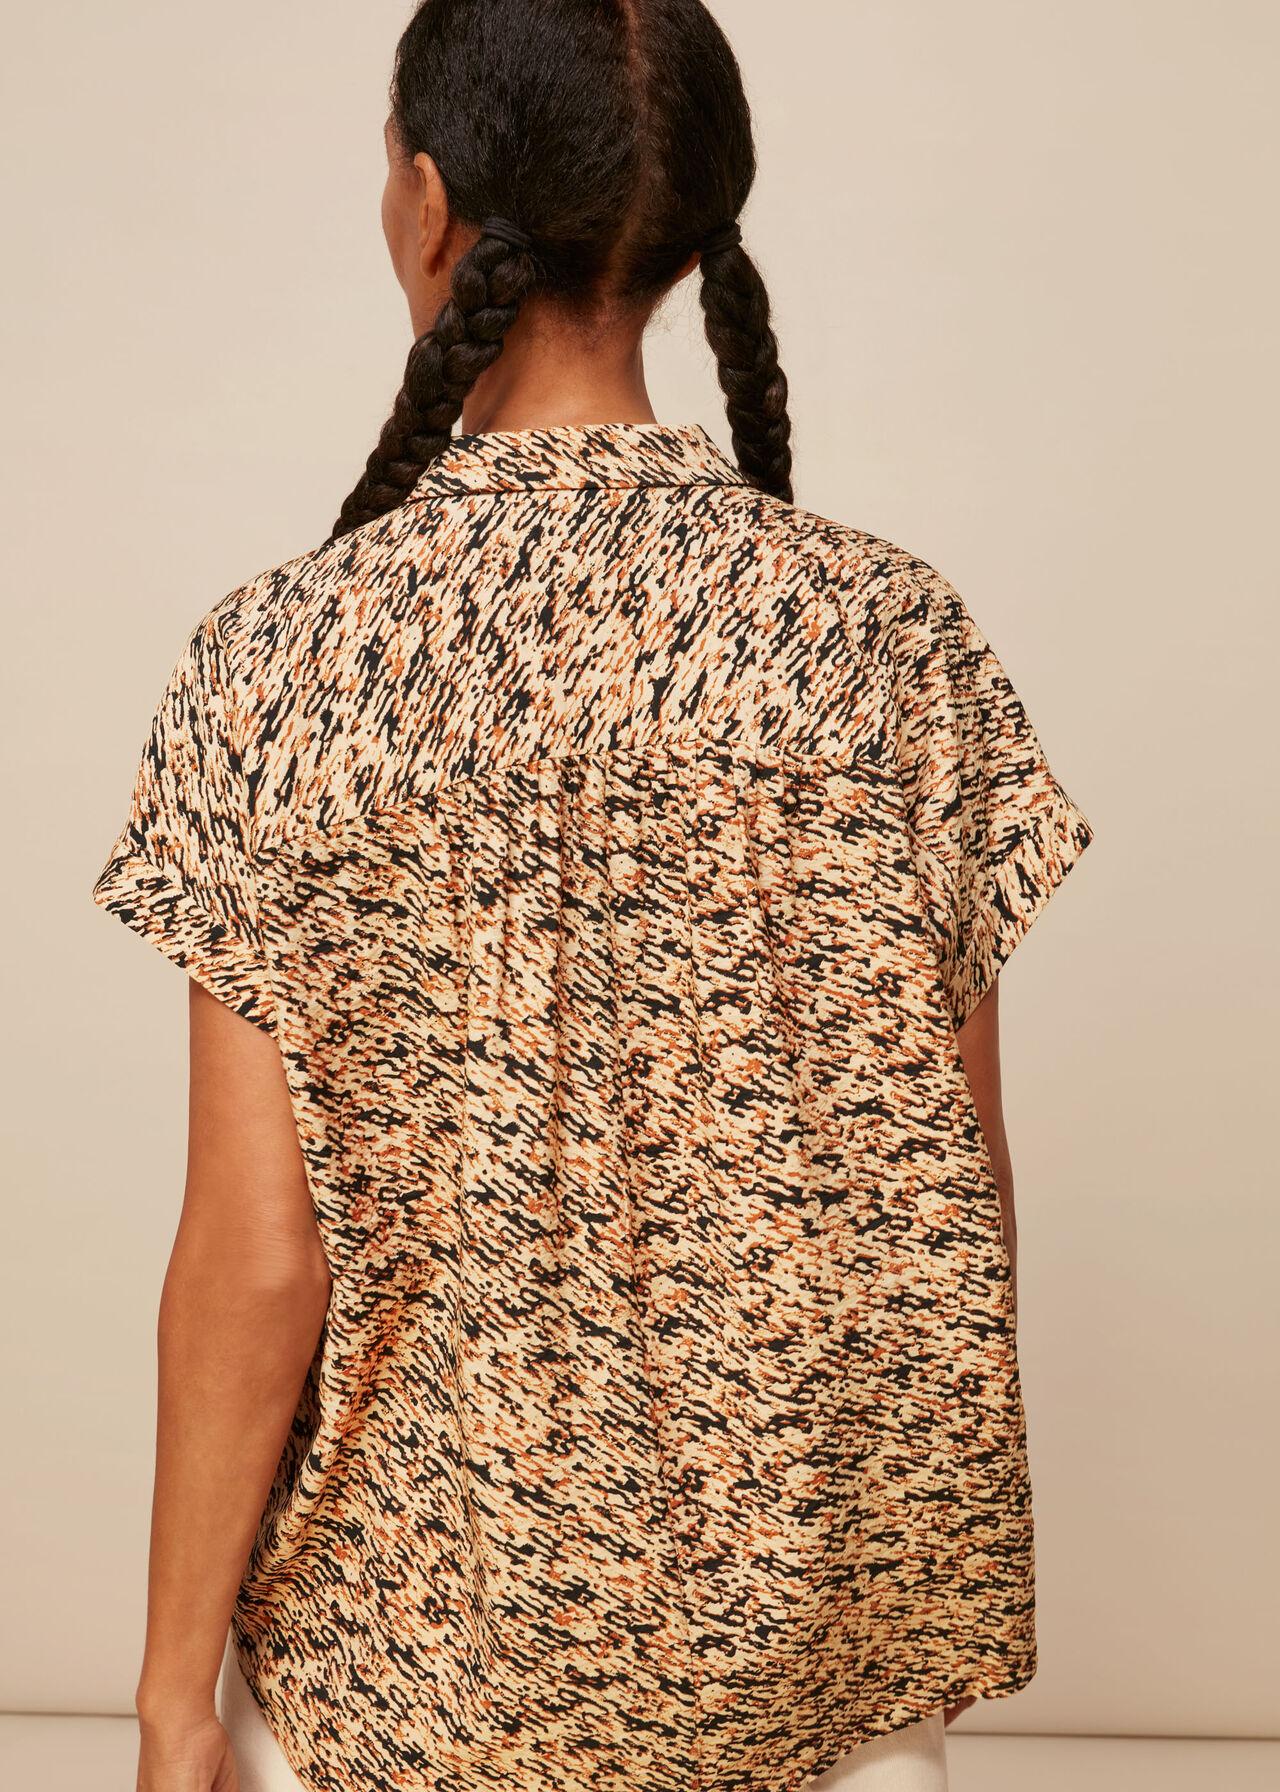 Bark Print Nicola Shirt